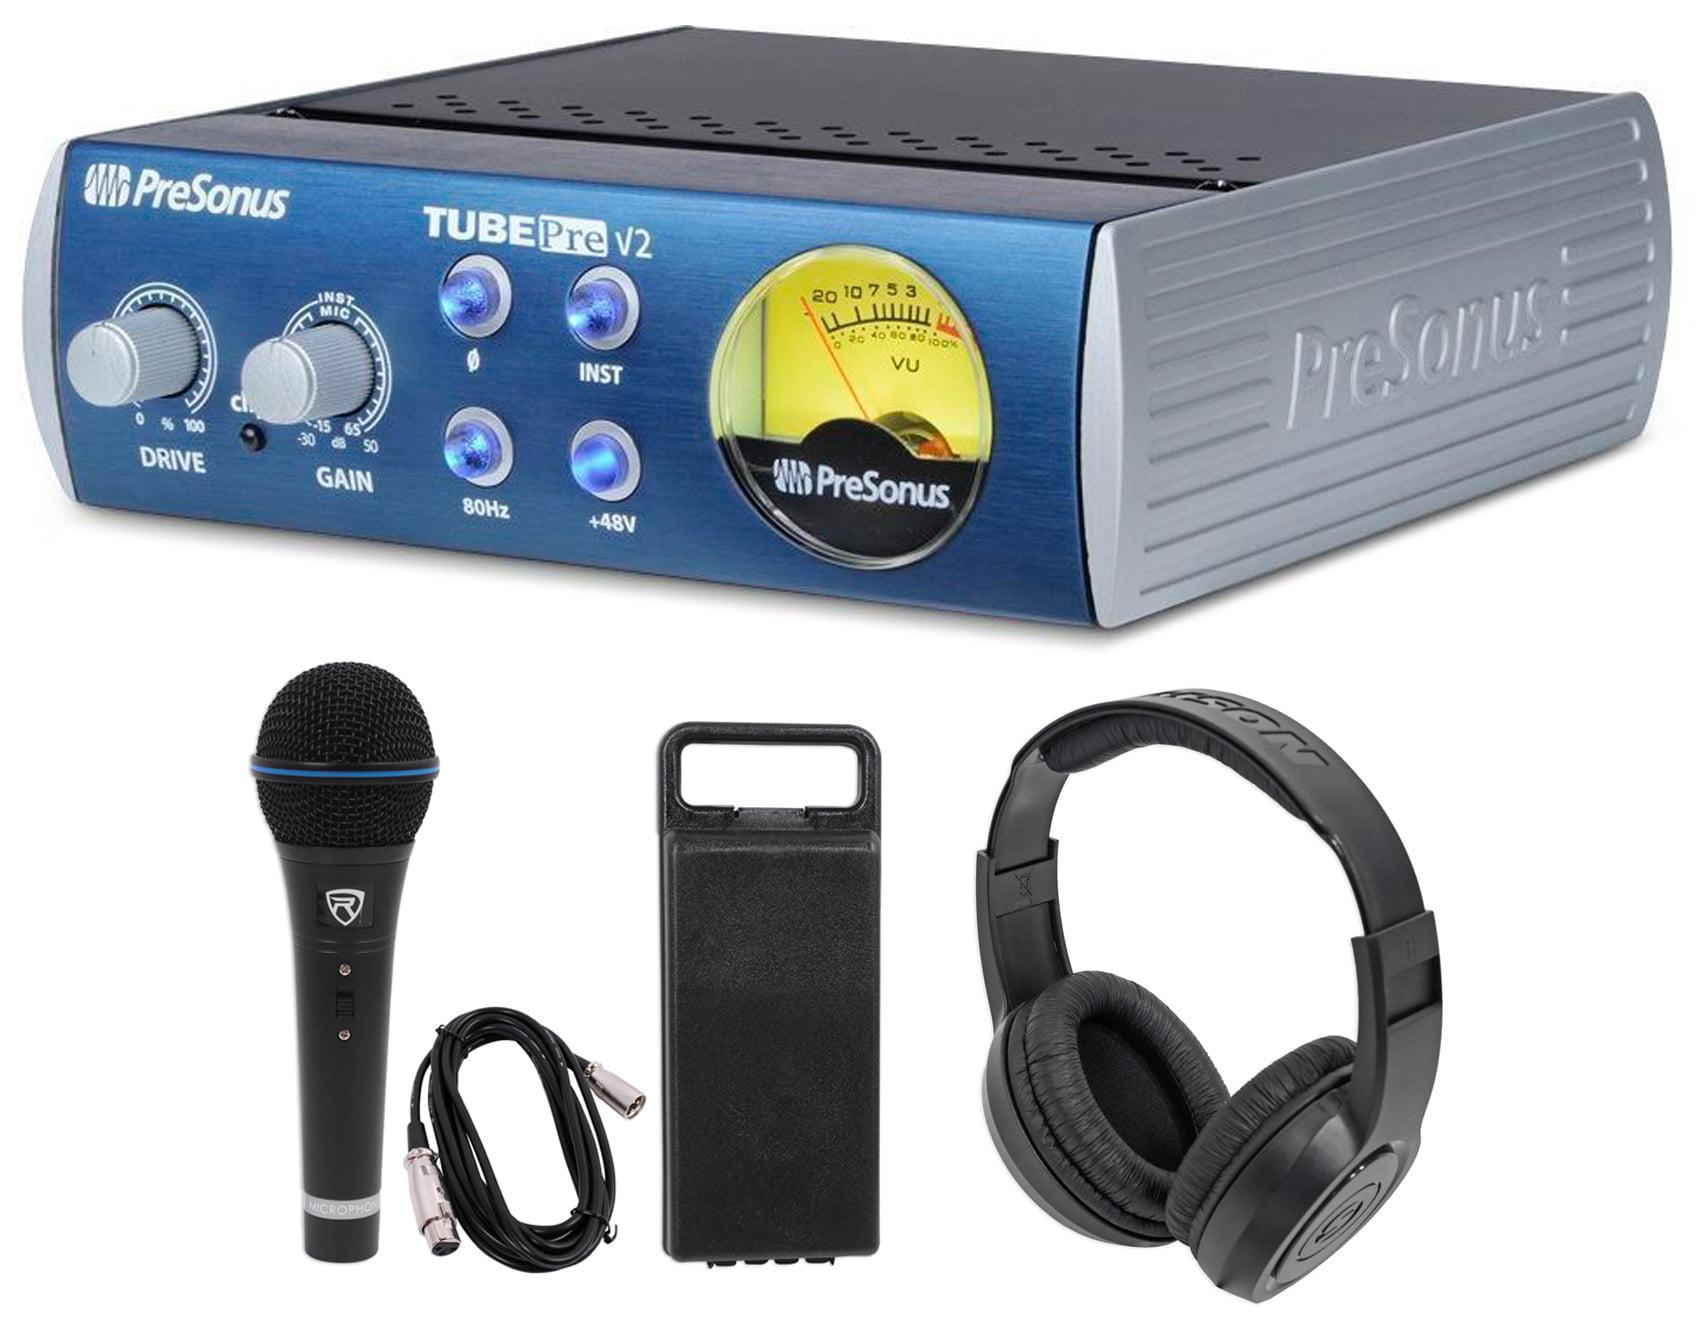 Presonus TubePre V2 Vacuum Tube Preamp+DI Direct Box+Microphone + Headphones by PreSonus